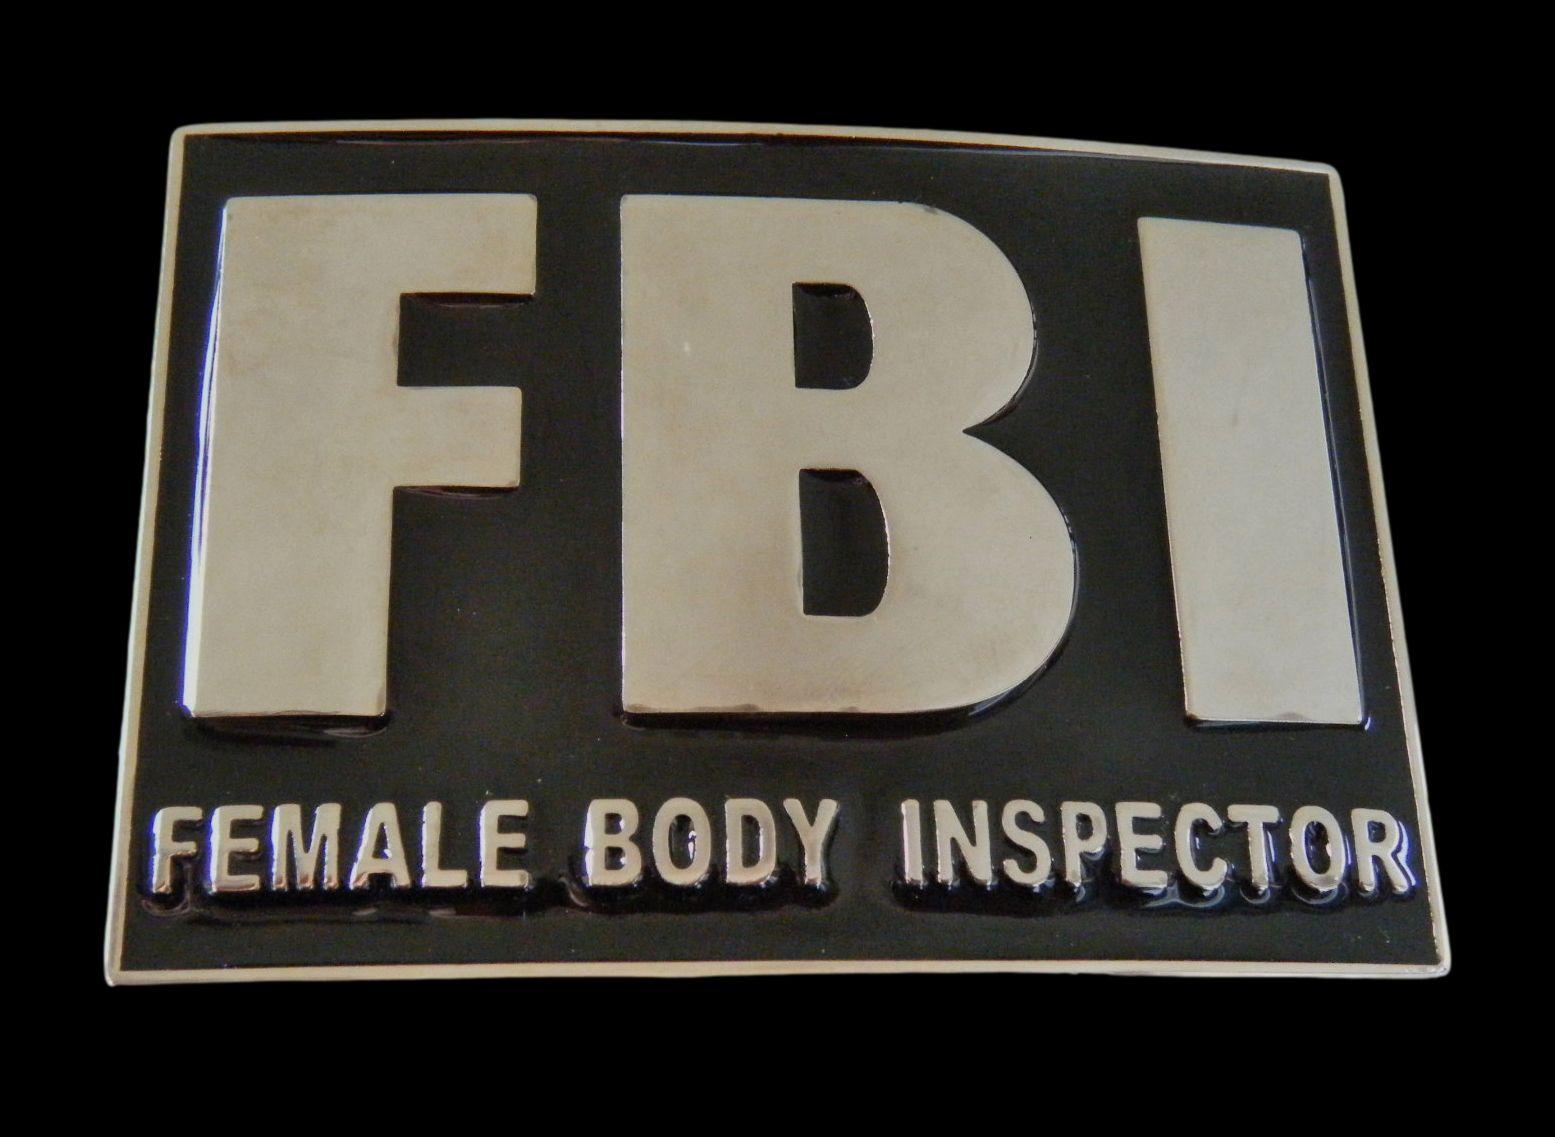 Fbi Female Body F B I Inspector Belt Buckle Buckles